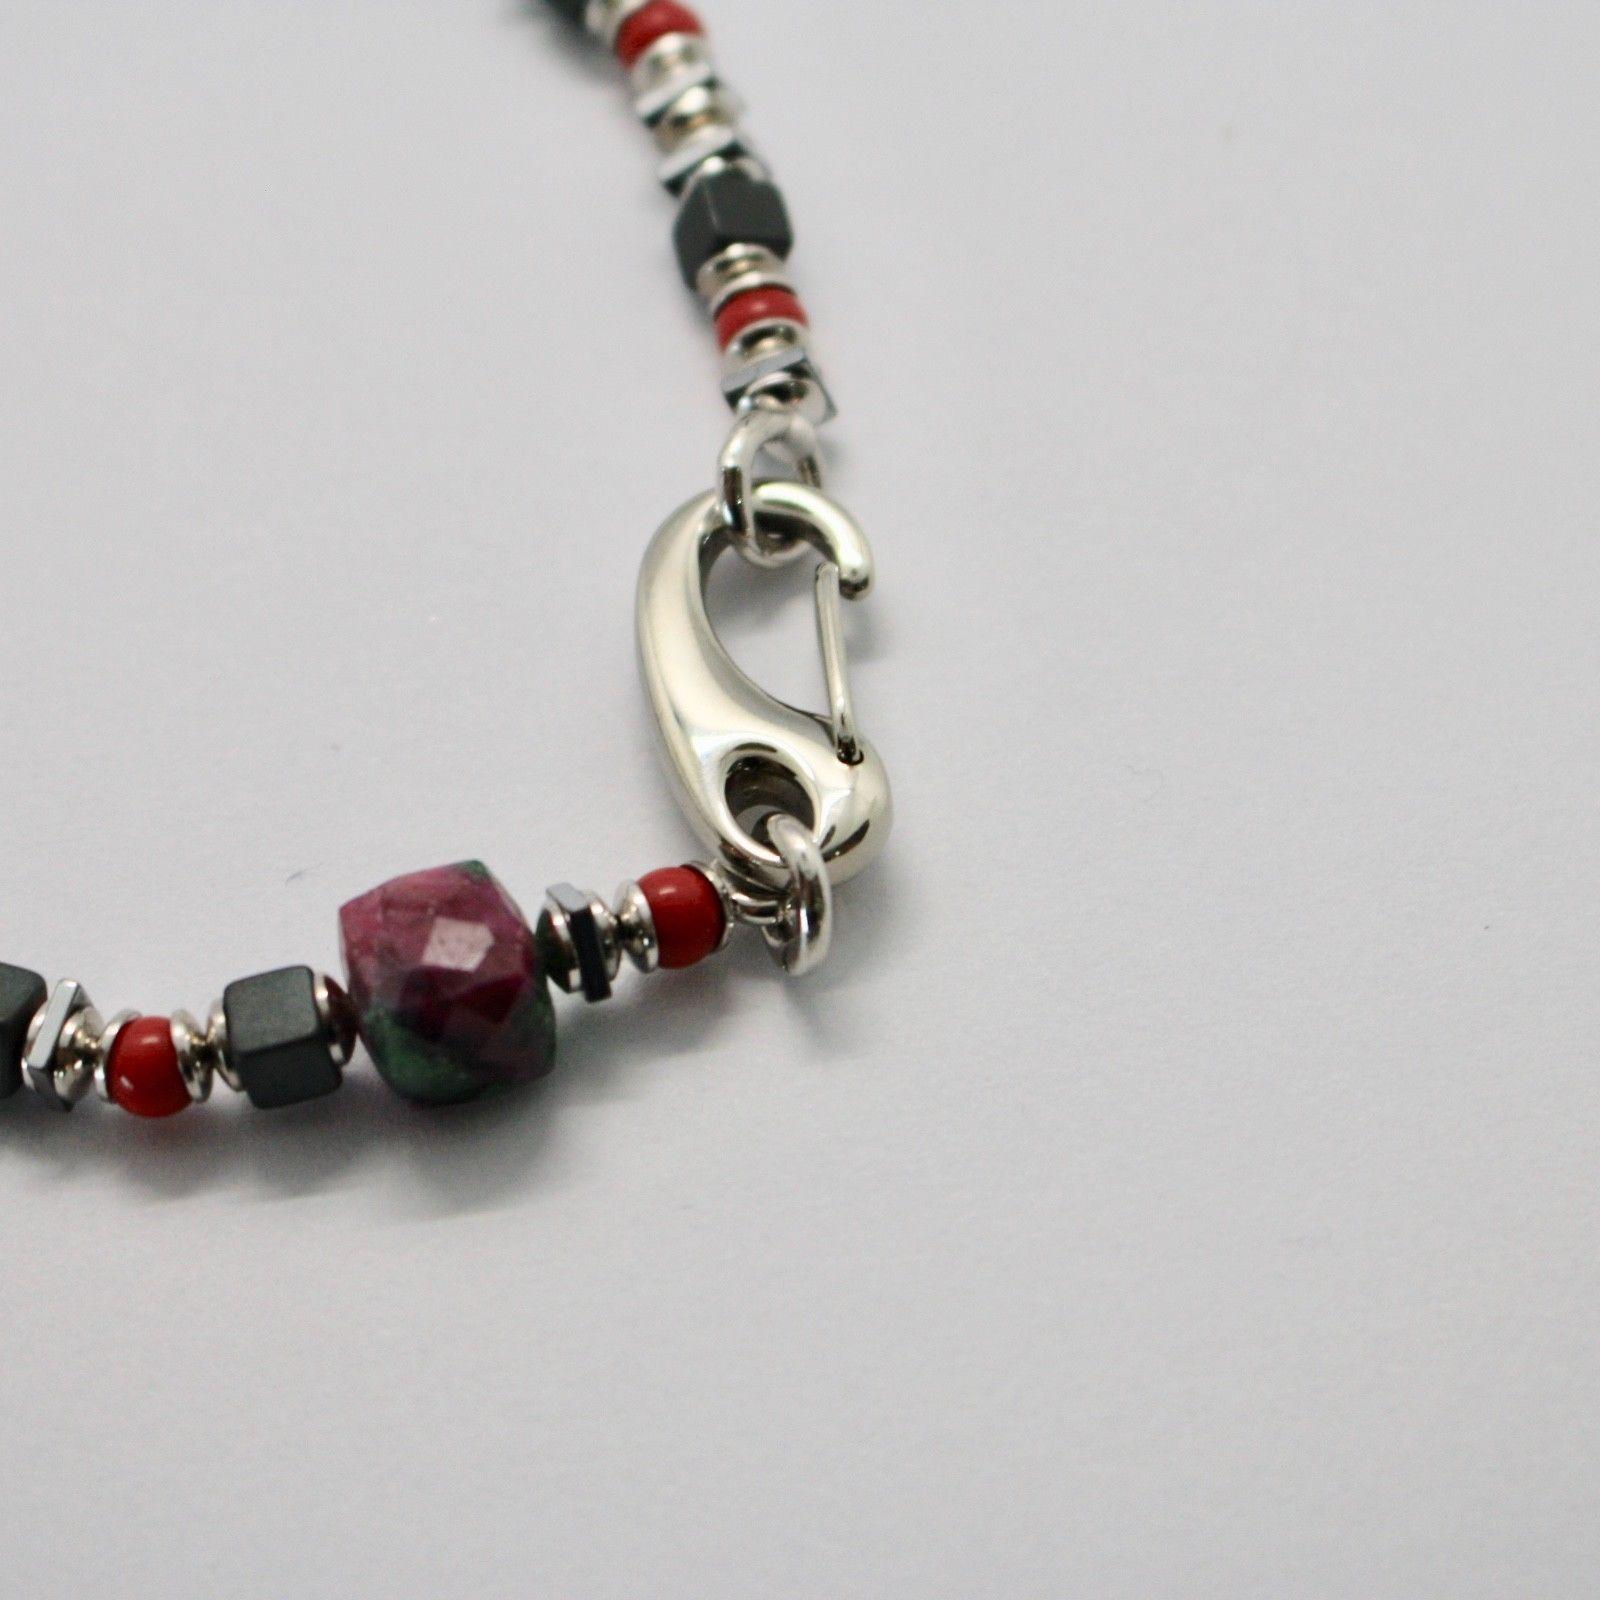 Bracelet en Argent 925 Rubis Zoïsite Corail Bpan-13 Made IN Italy By Maschia